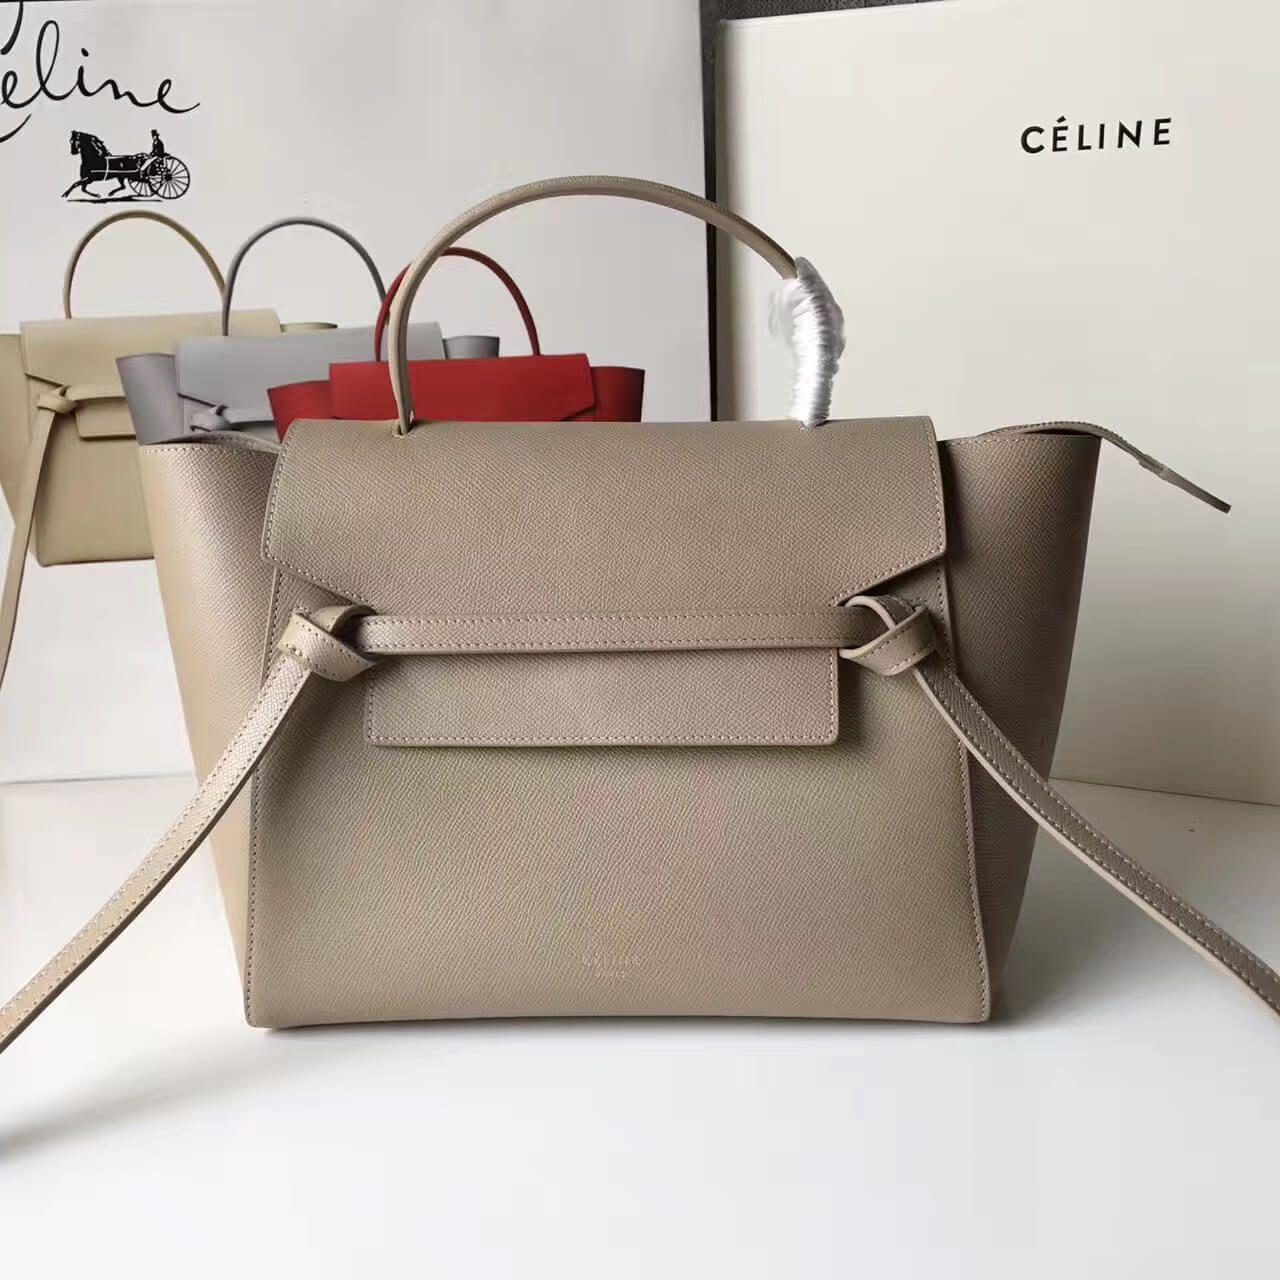 55d583ed746b0 Celine Mini Belt Handbag 100% Authentic 80% Off